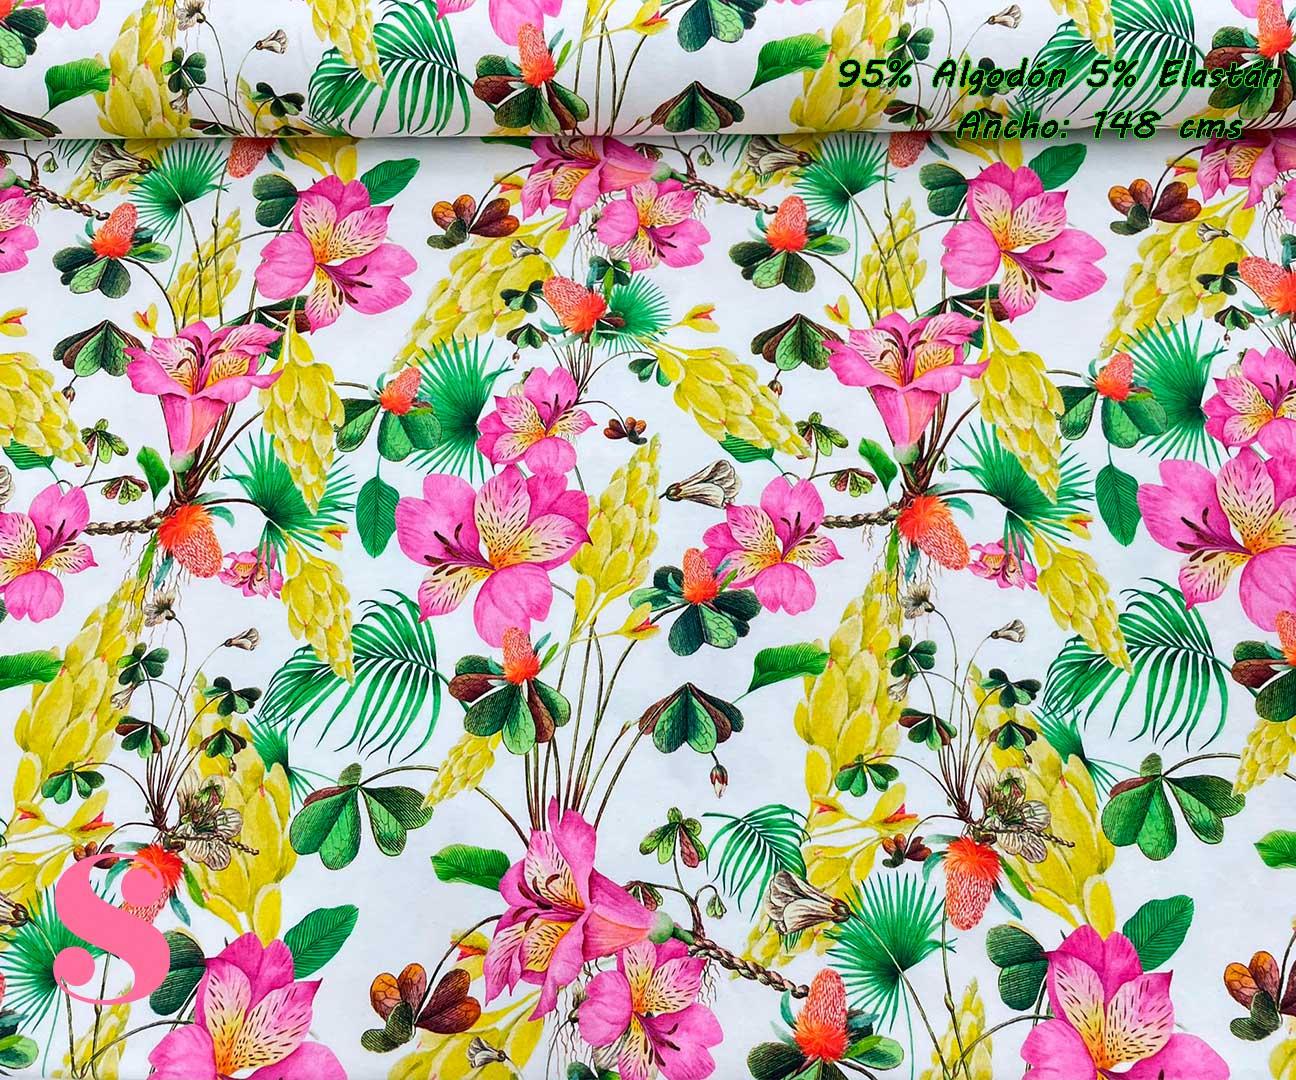 4-telas-de-punto-estampadas,punto-camiseta-estampado,punto-sudadera-estampado,french-terry-estampado, Punto Camiseta Estampado Flores Tropicales